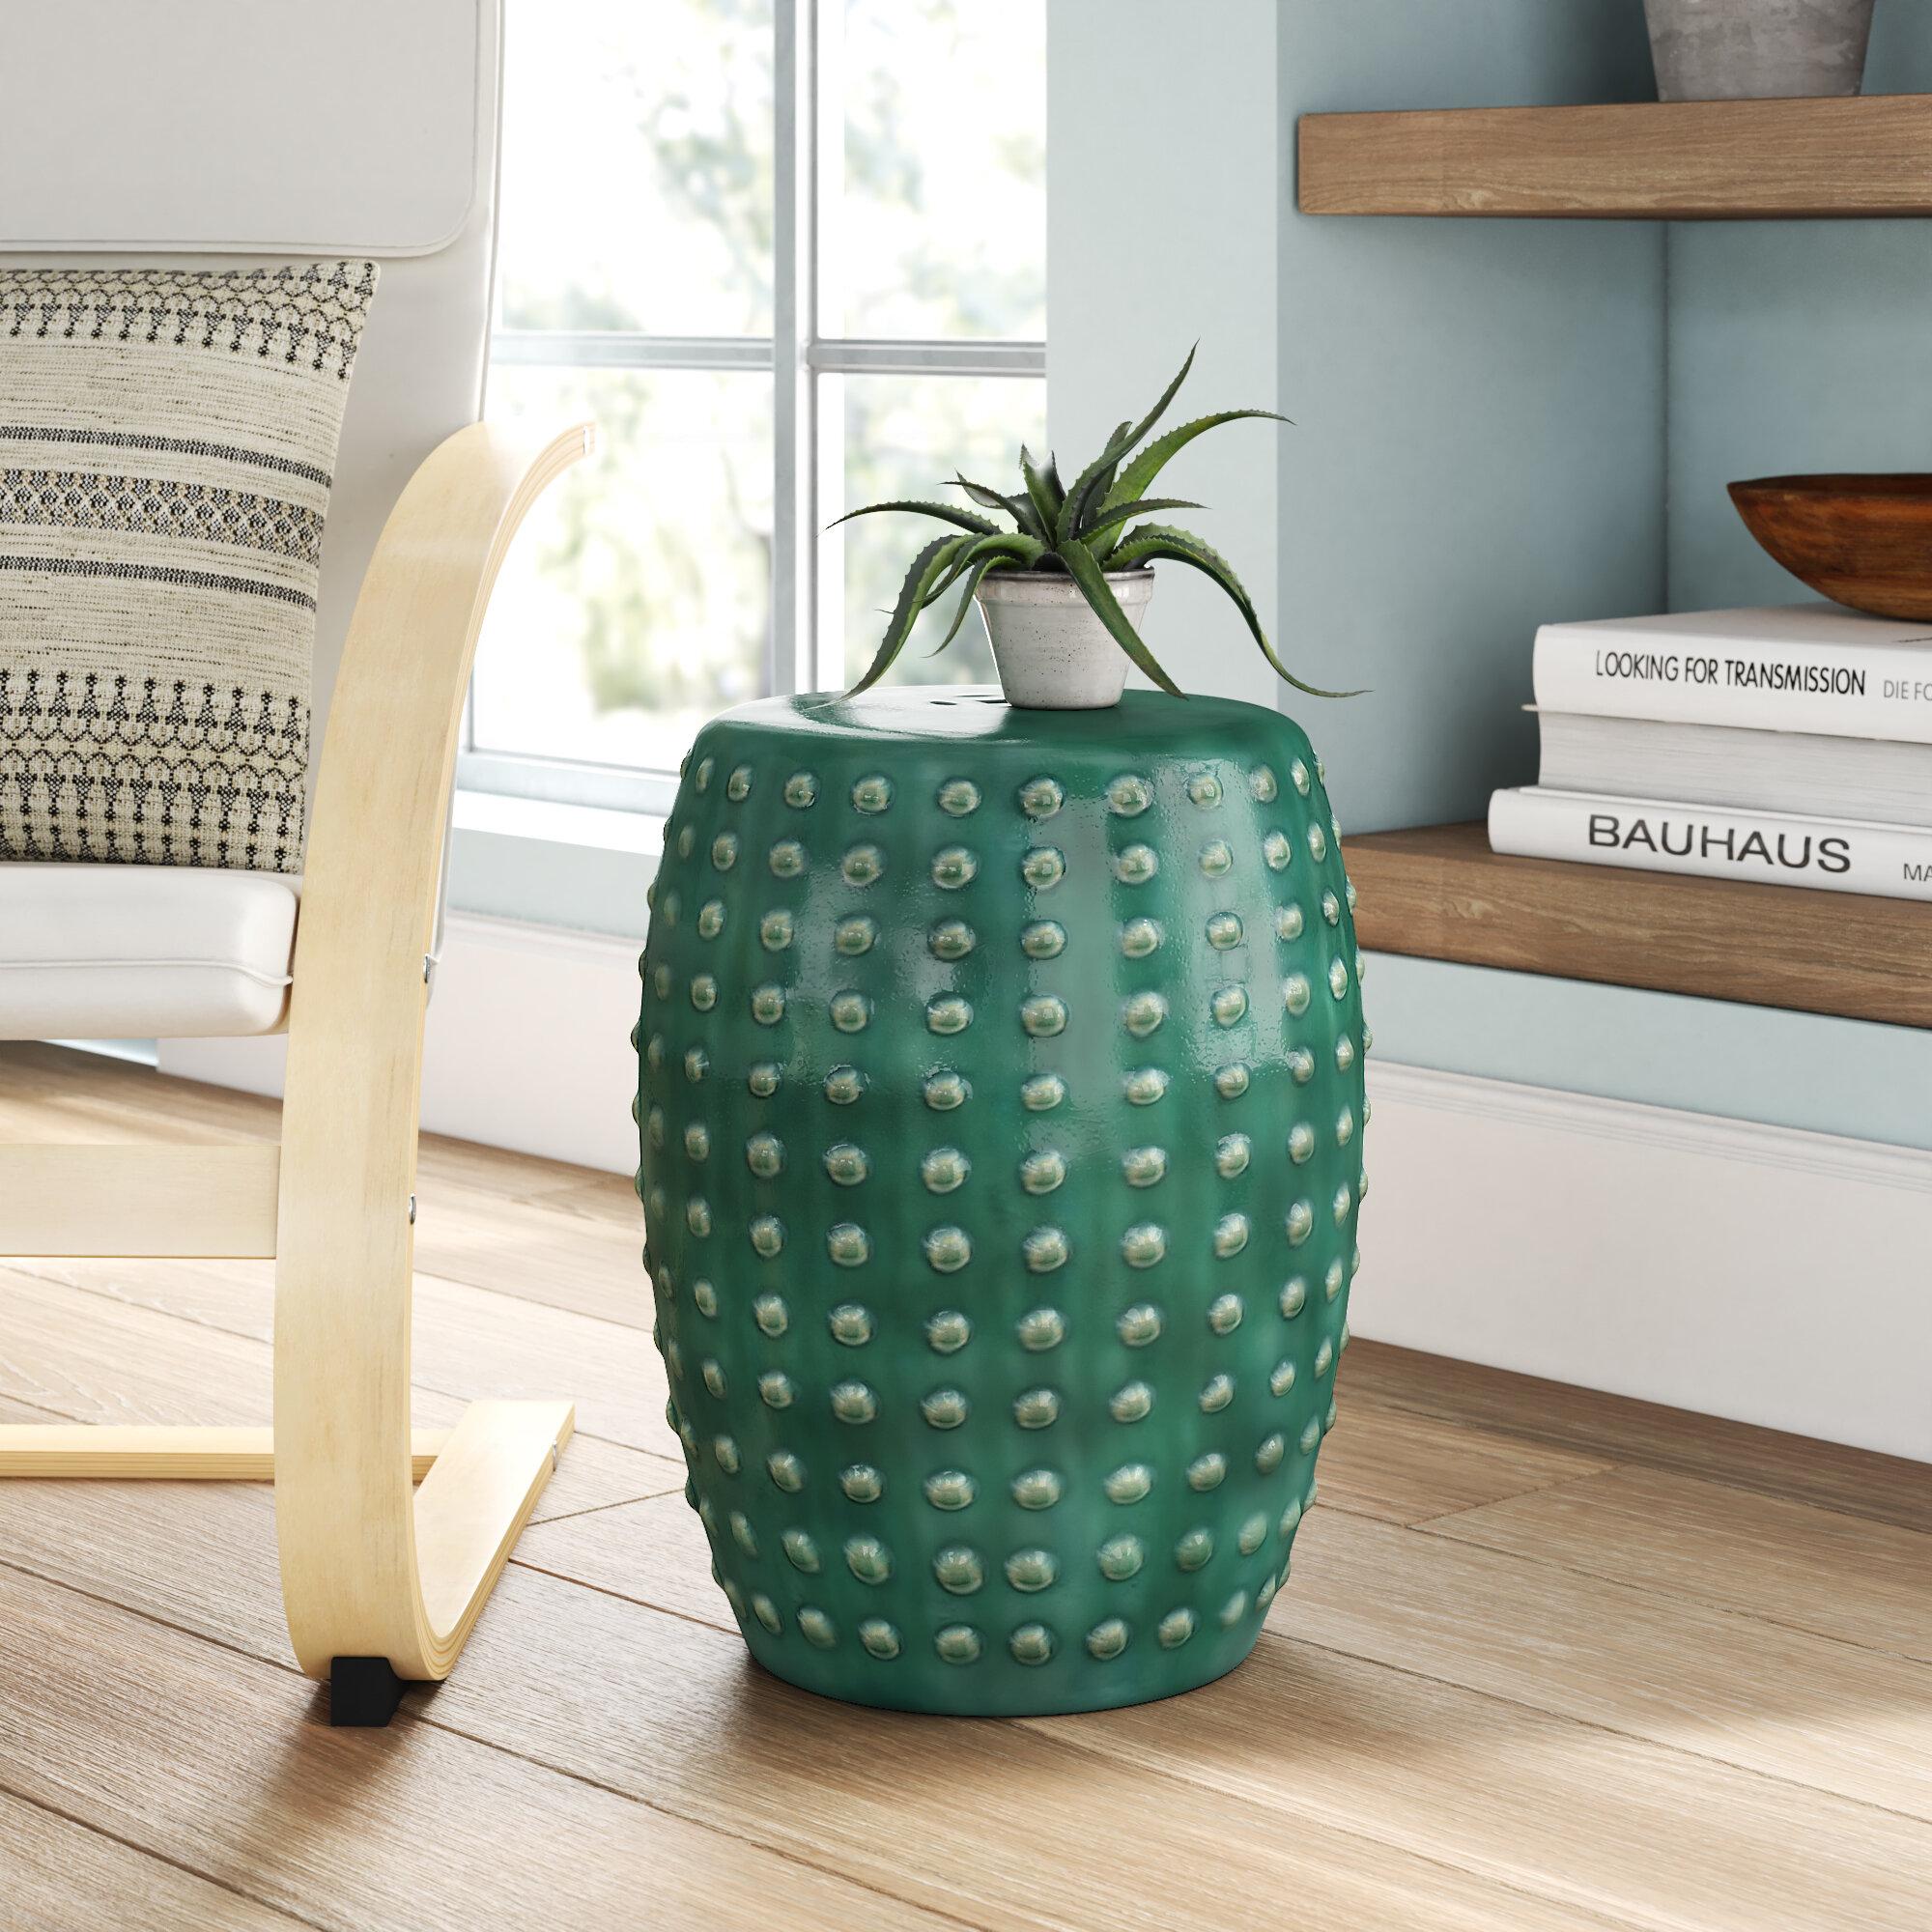 Phenomenal Renee Porcelain Garden Stool Andrewgaddart Wooden Chair Designs For Living Room Andrewgaddartcom